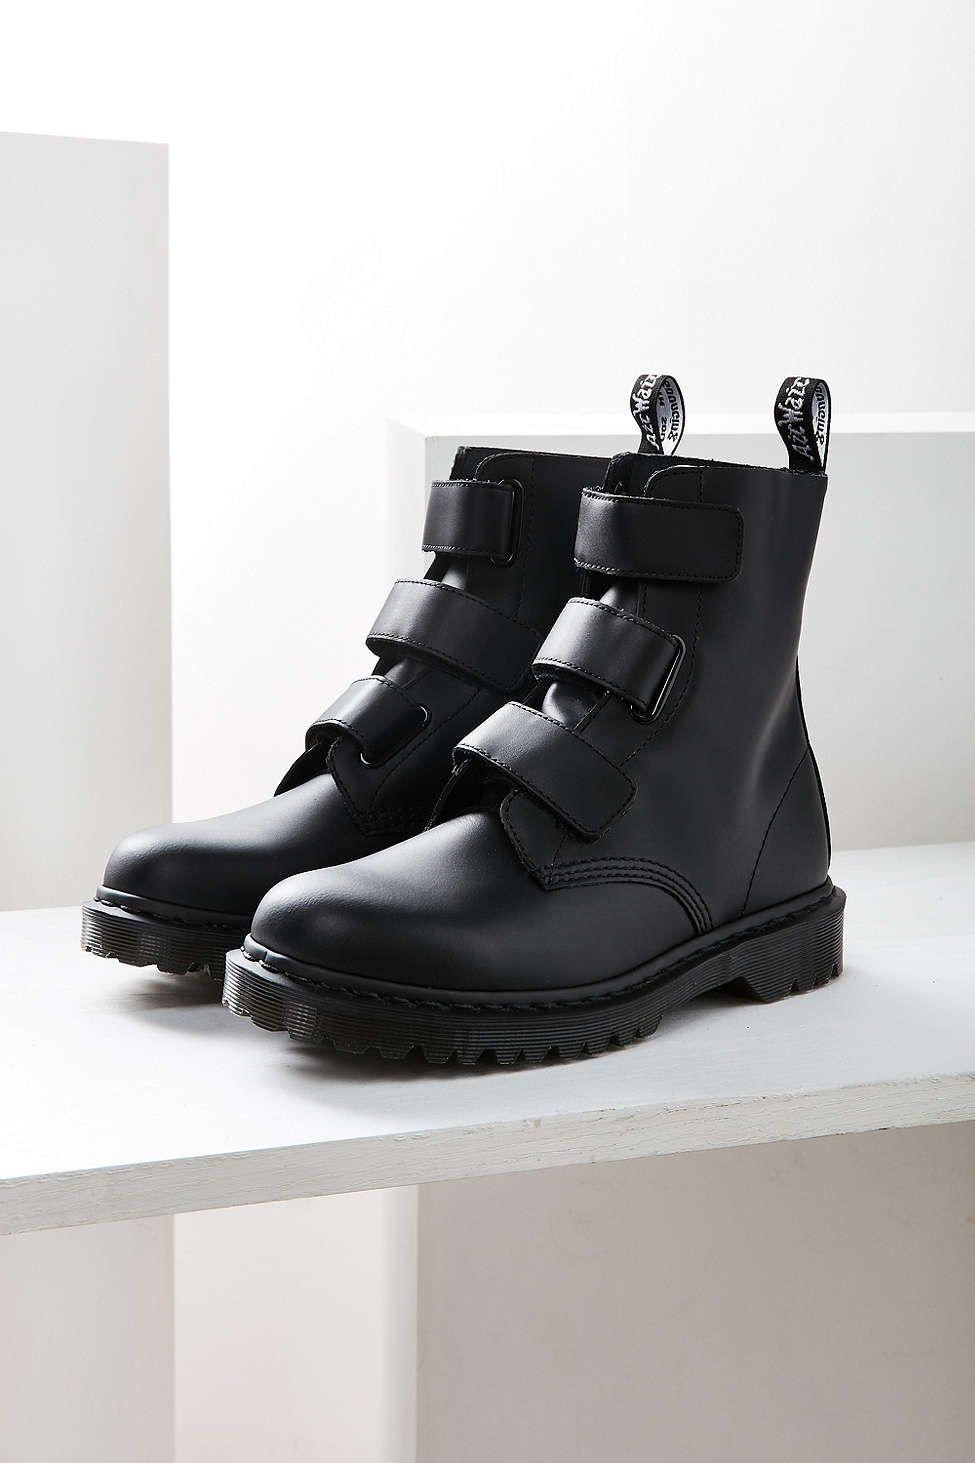 0f68c8579873 Dr. Martens Coralia Velcro Boot   Sinn   Boots, Shoes, Dr martens boots